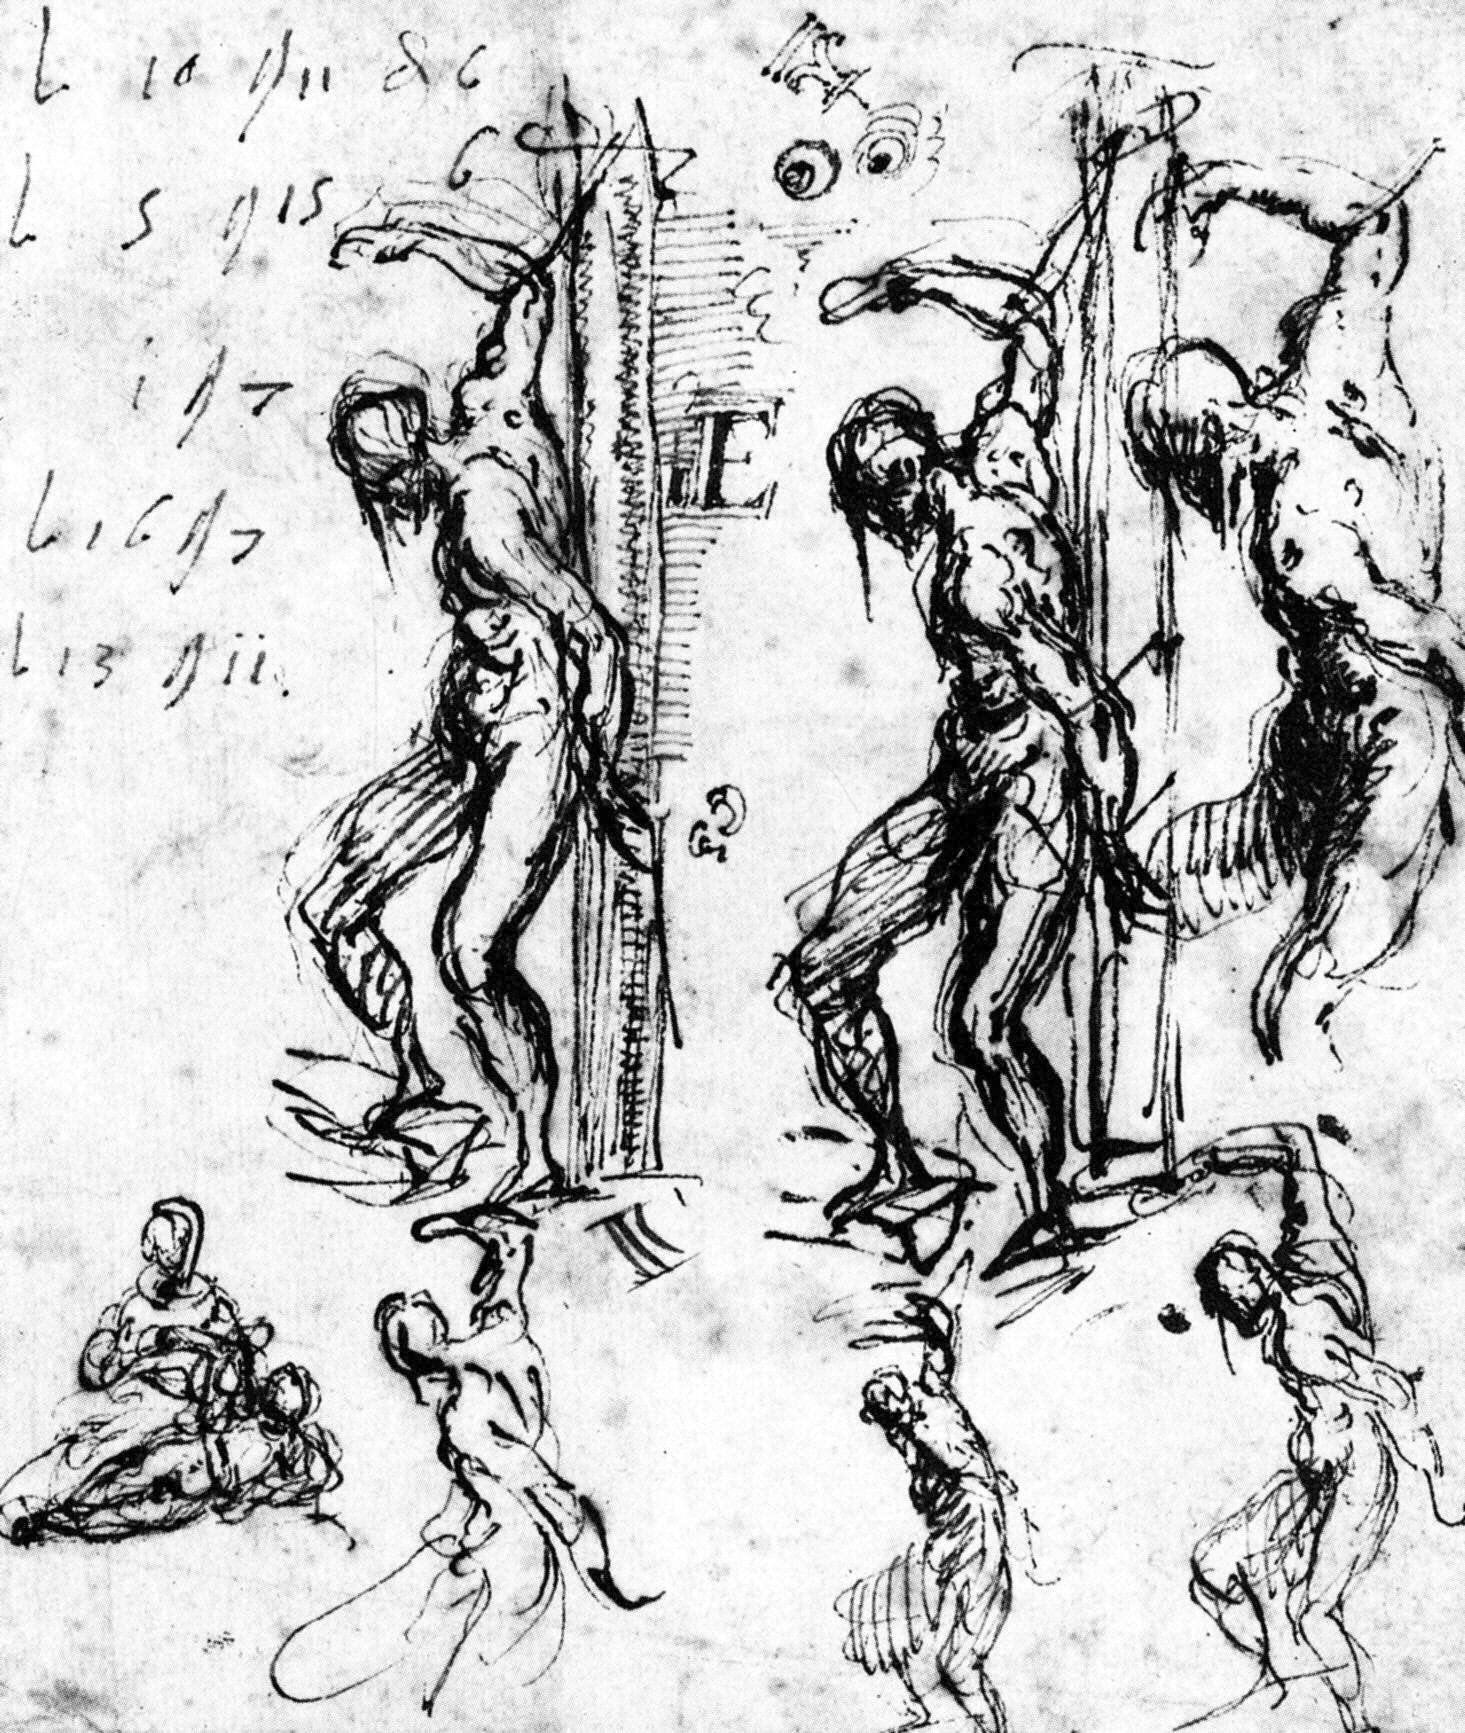 tiziano-stseb-rajz2-1520.jpg